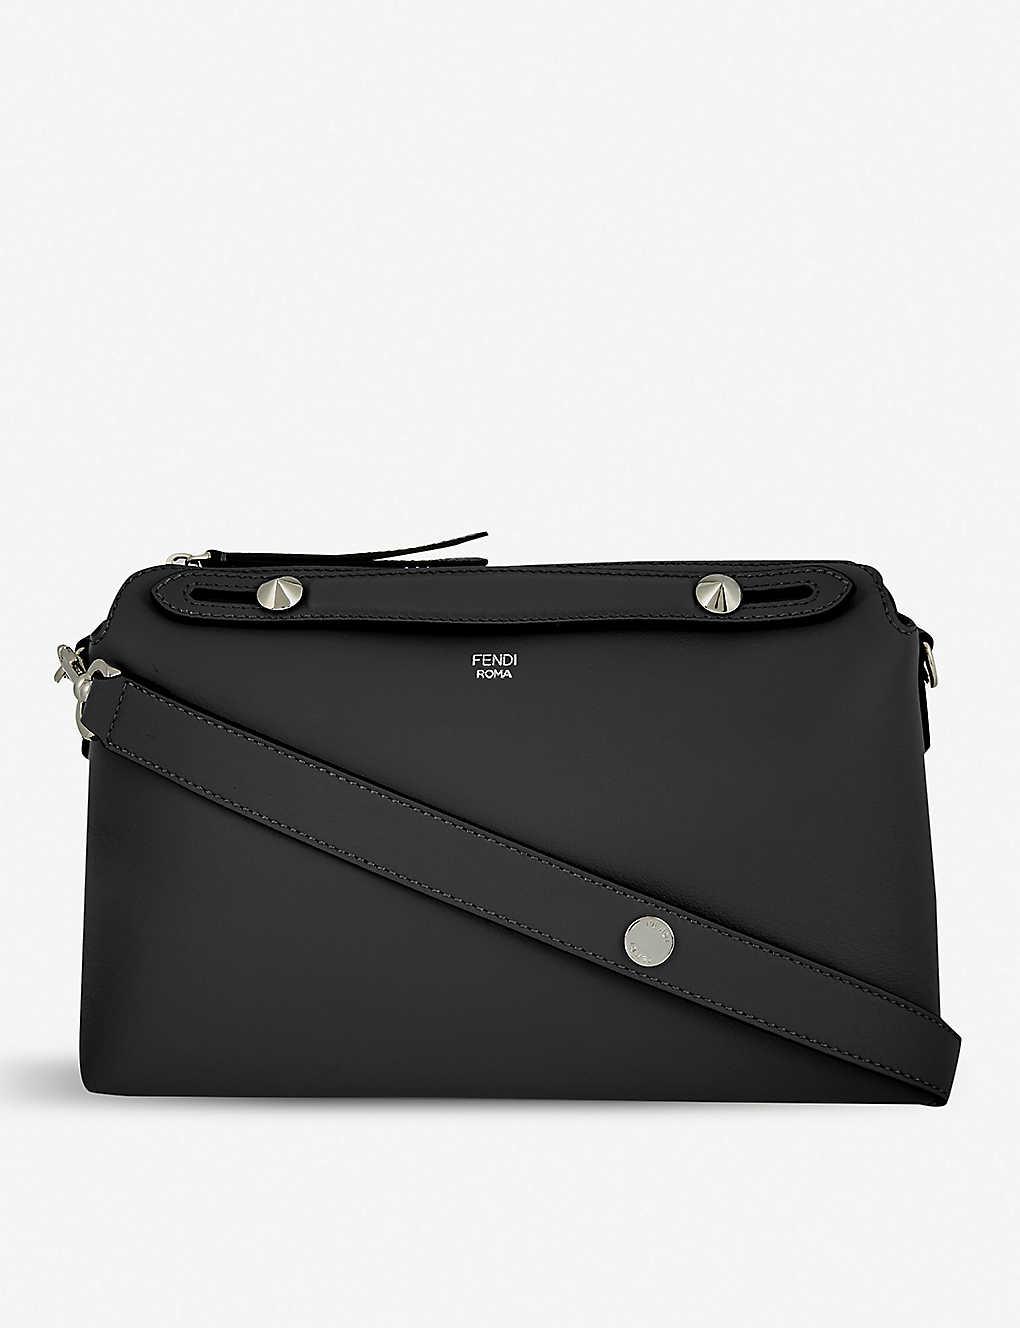 3e74c59b7e89 By The Way small leather tote - Black ...